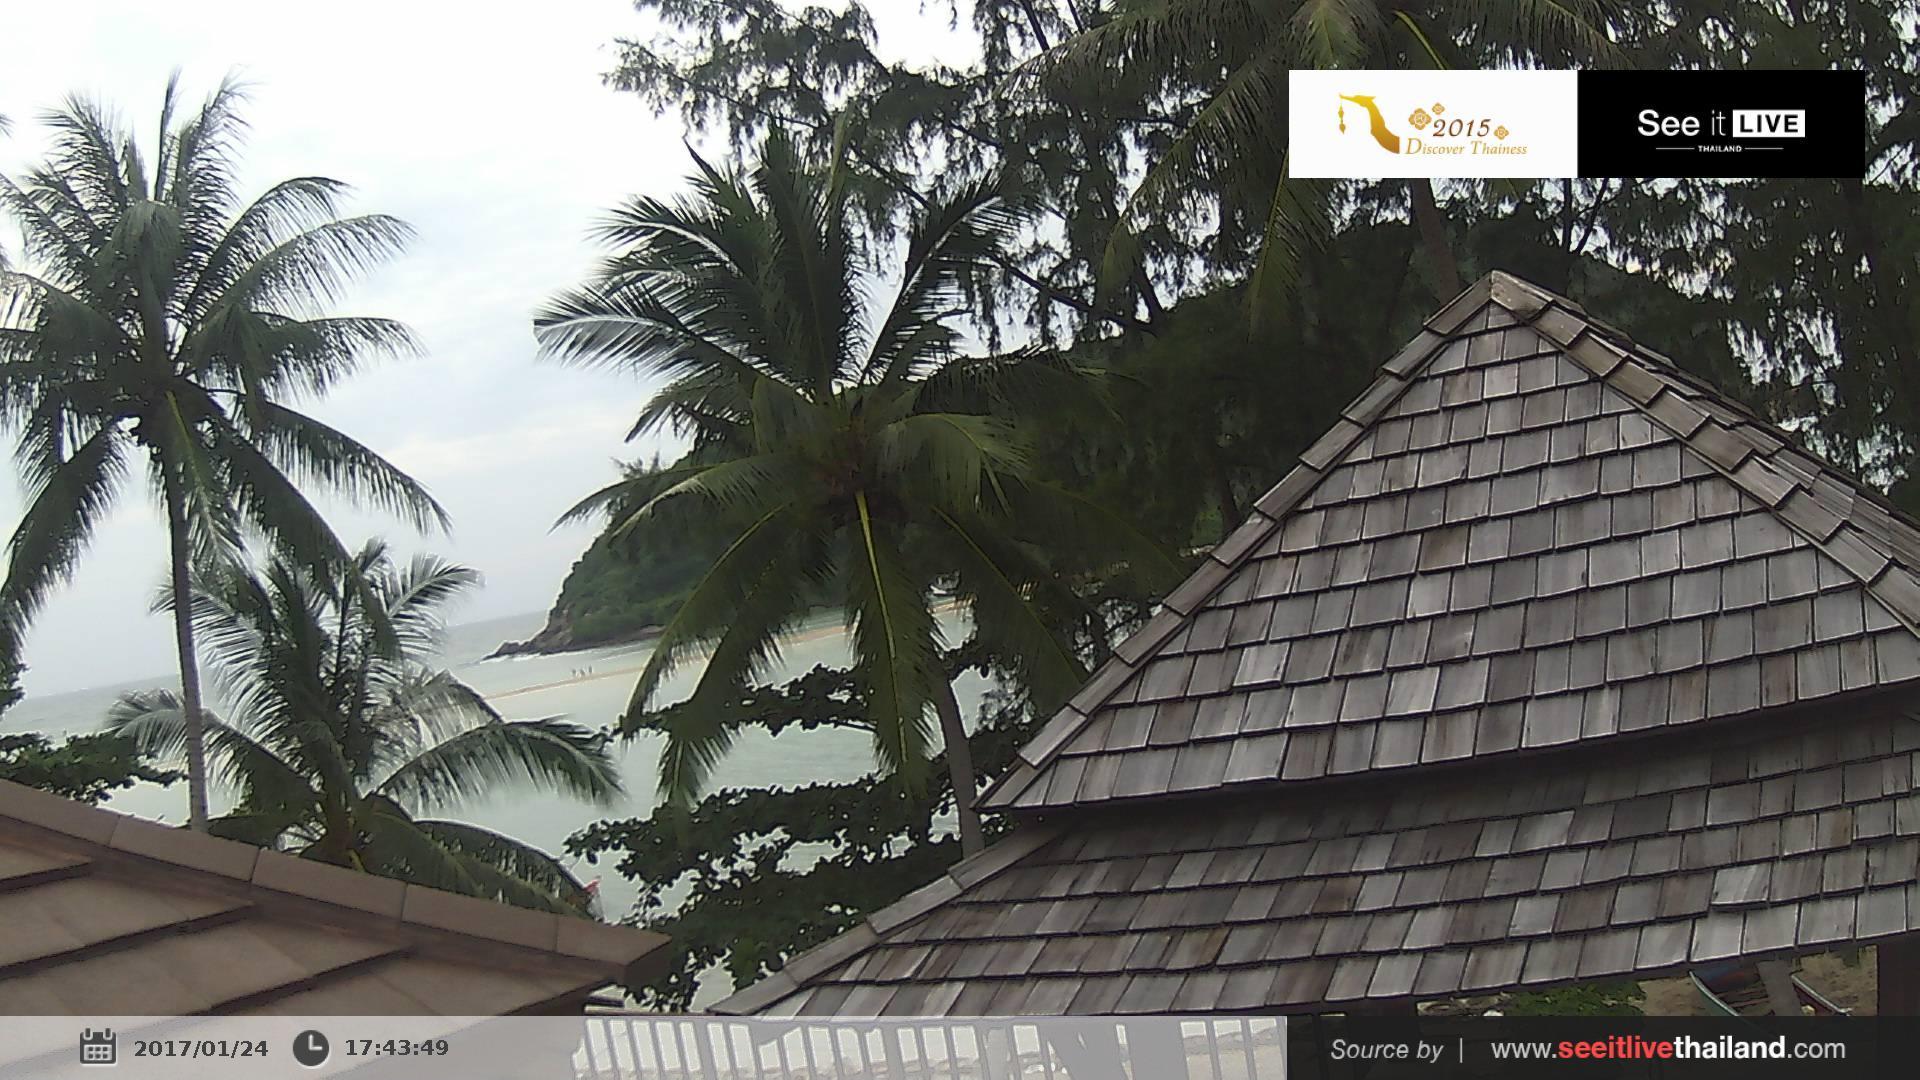 Webcam บ้านแม่หาด: Maehaad Bay Resort